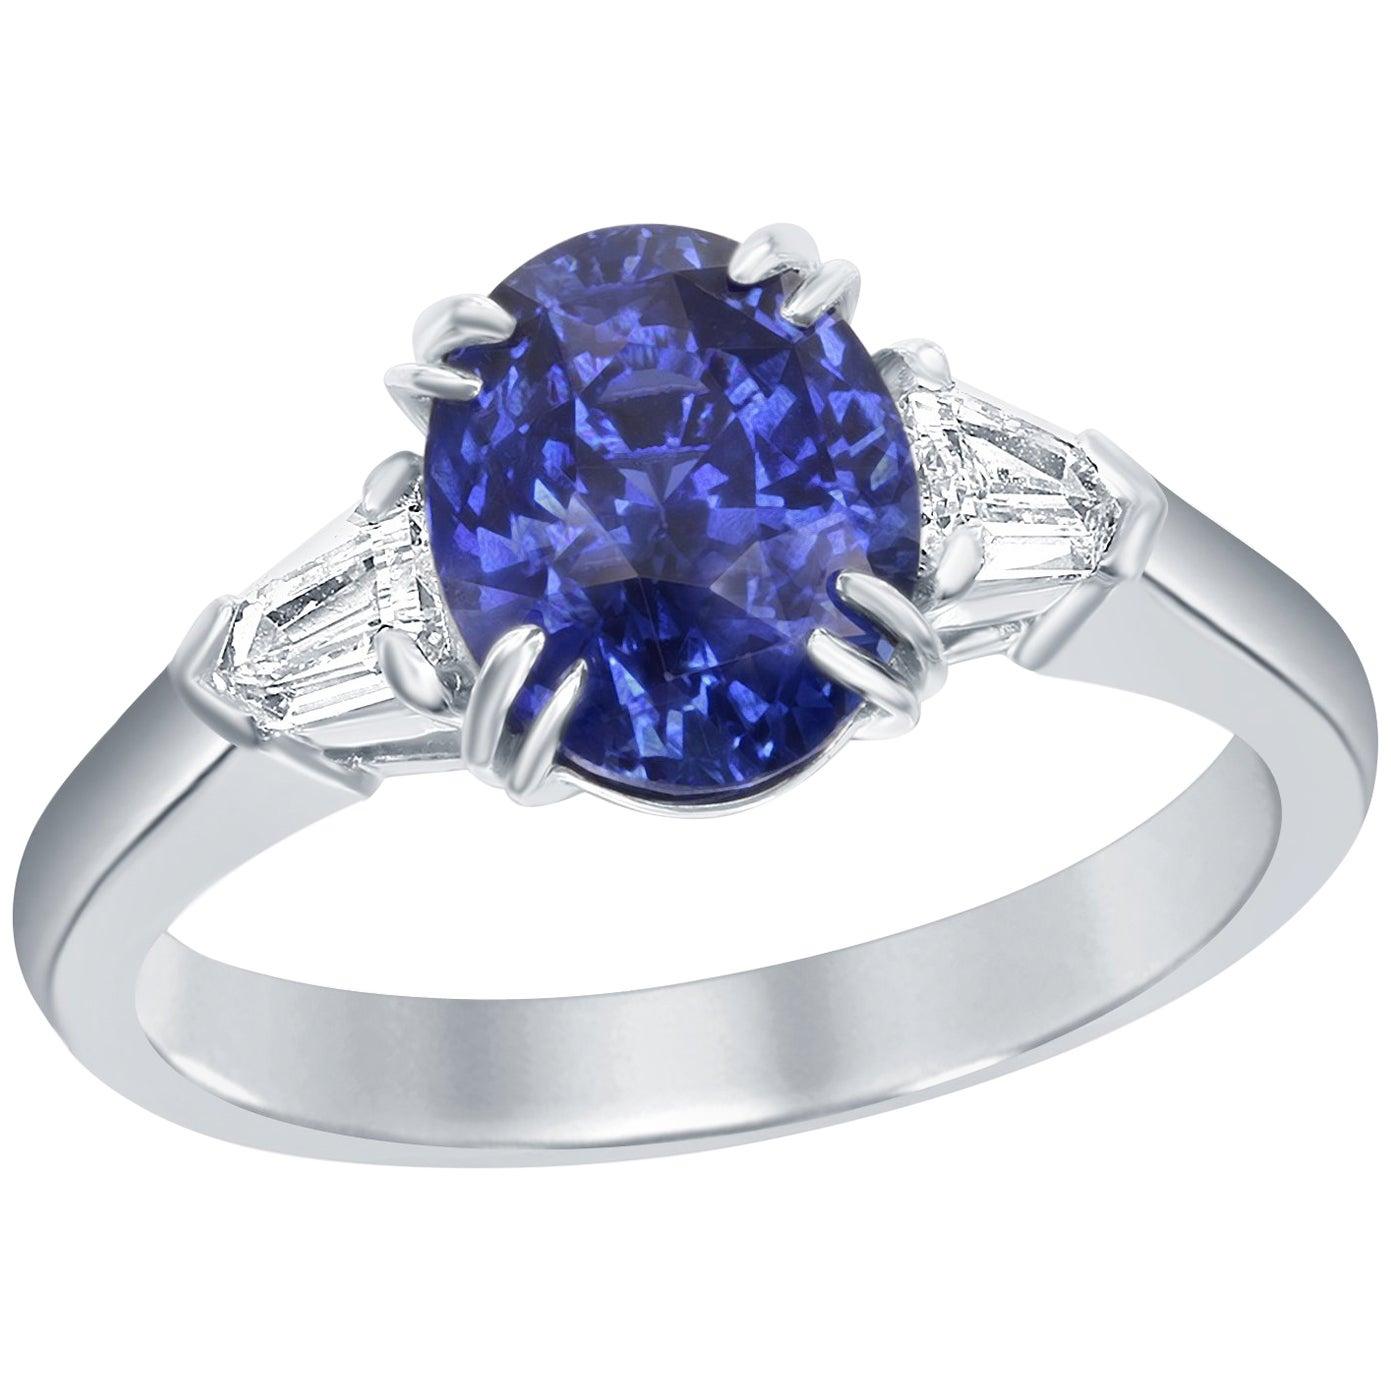 GIA Certified 2.38 Carat No-Heat Blue Sapphire Diamond Three-Stone Ring